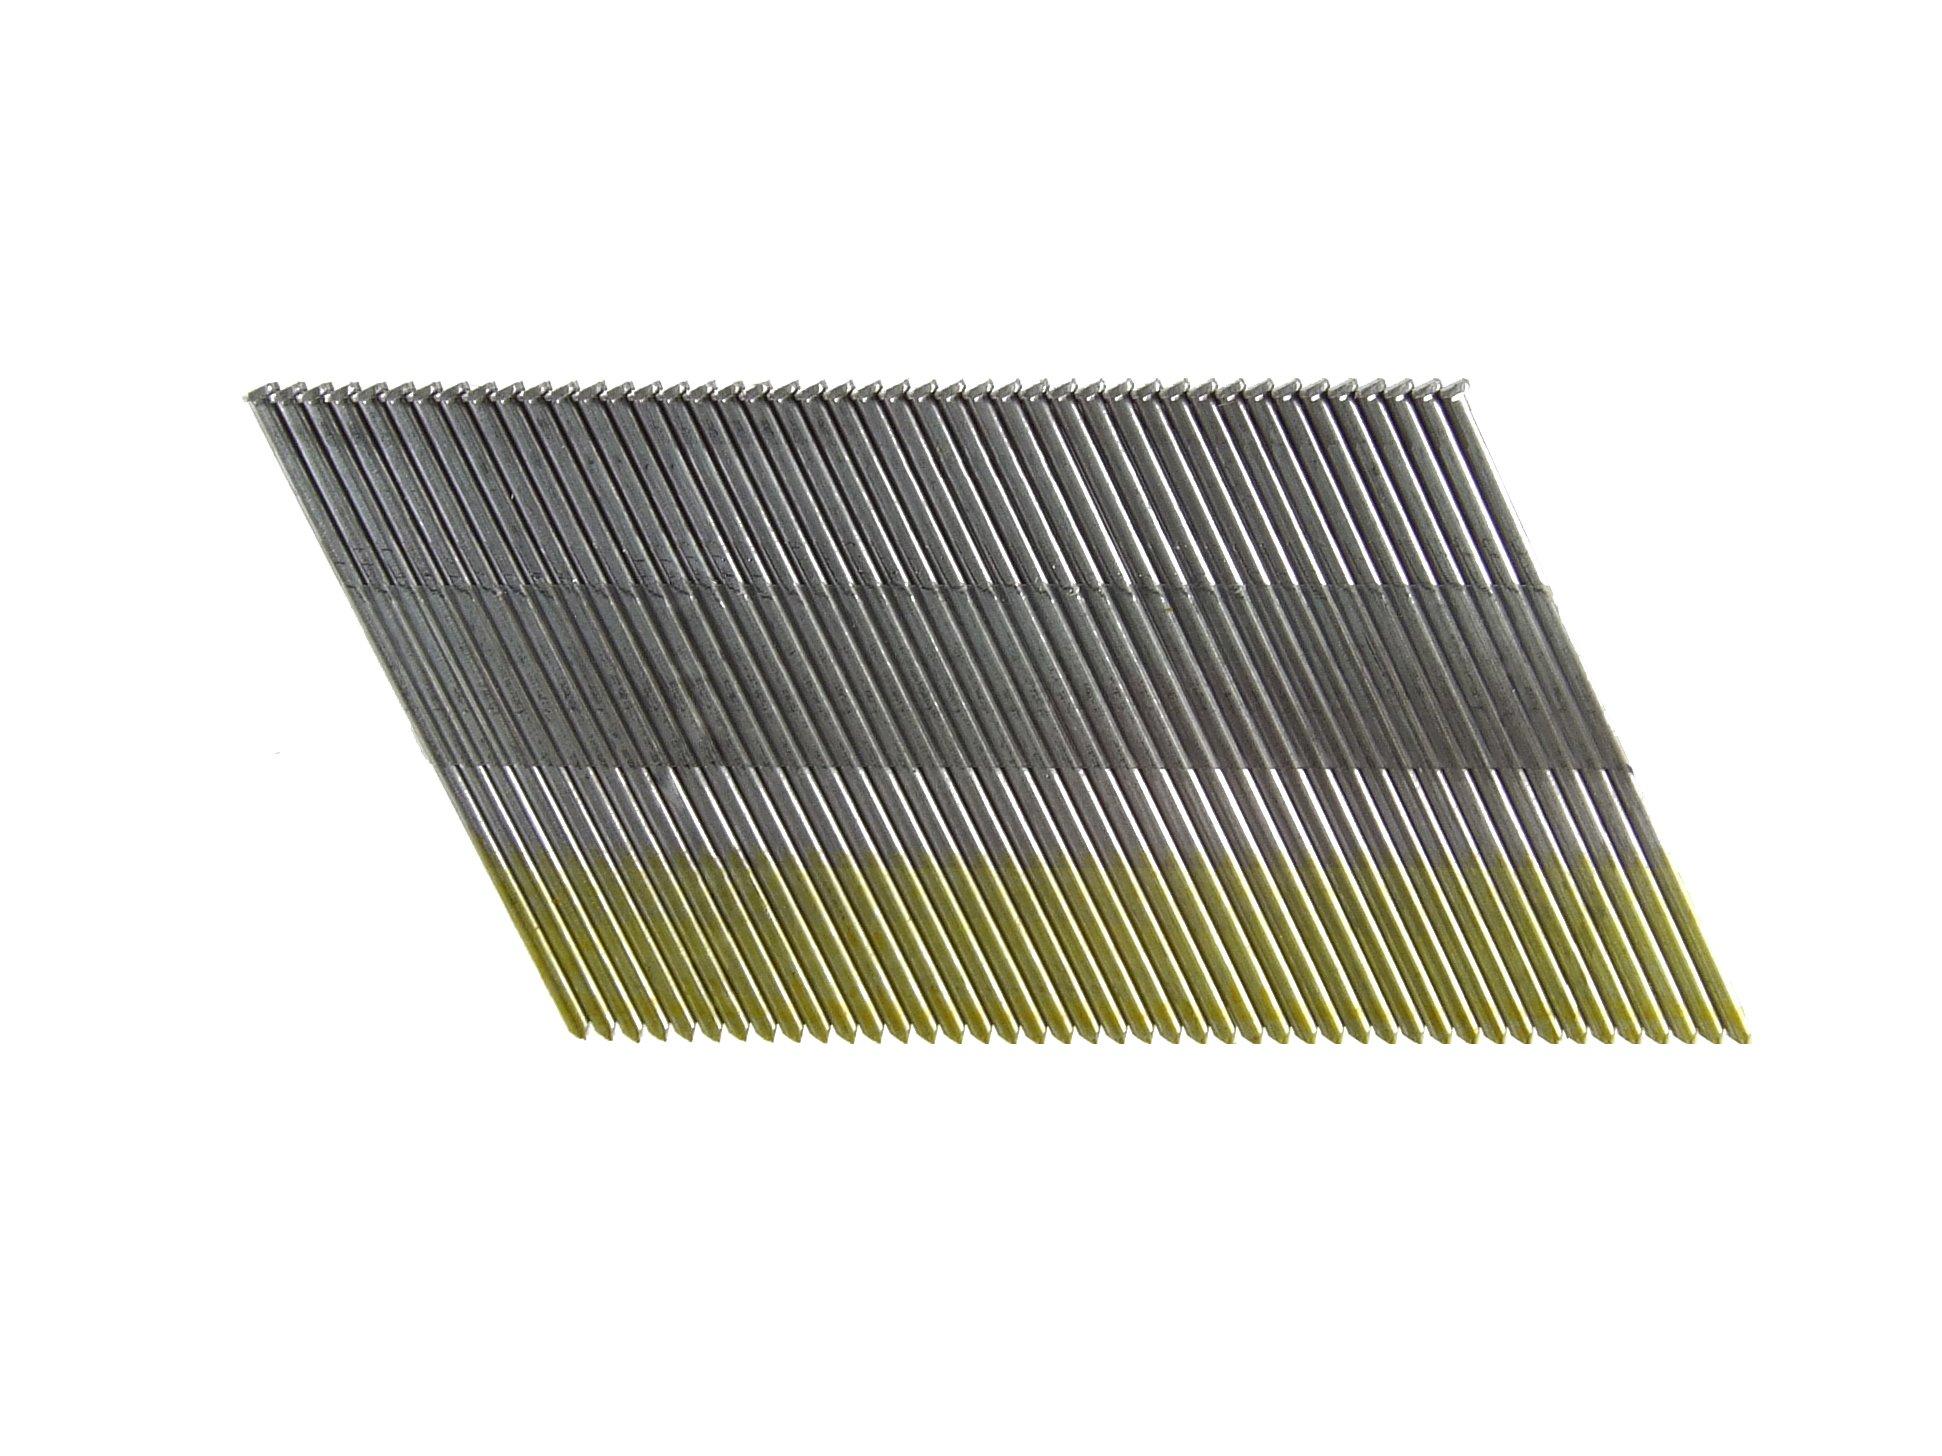 B&C Eagle BFN-212G 2-1/2-Inch x 25 Degree Galvanized Angle Finish Nails (3,500 per box)